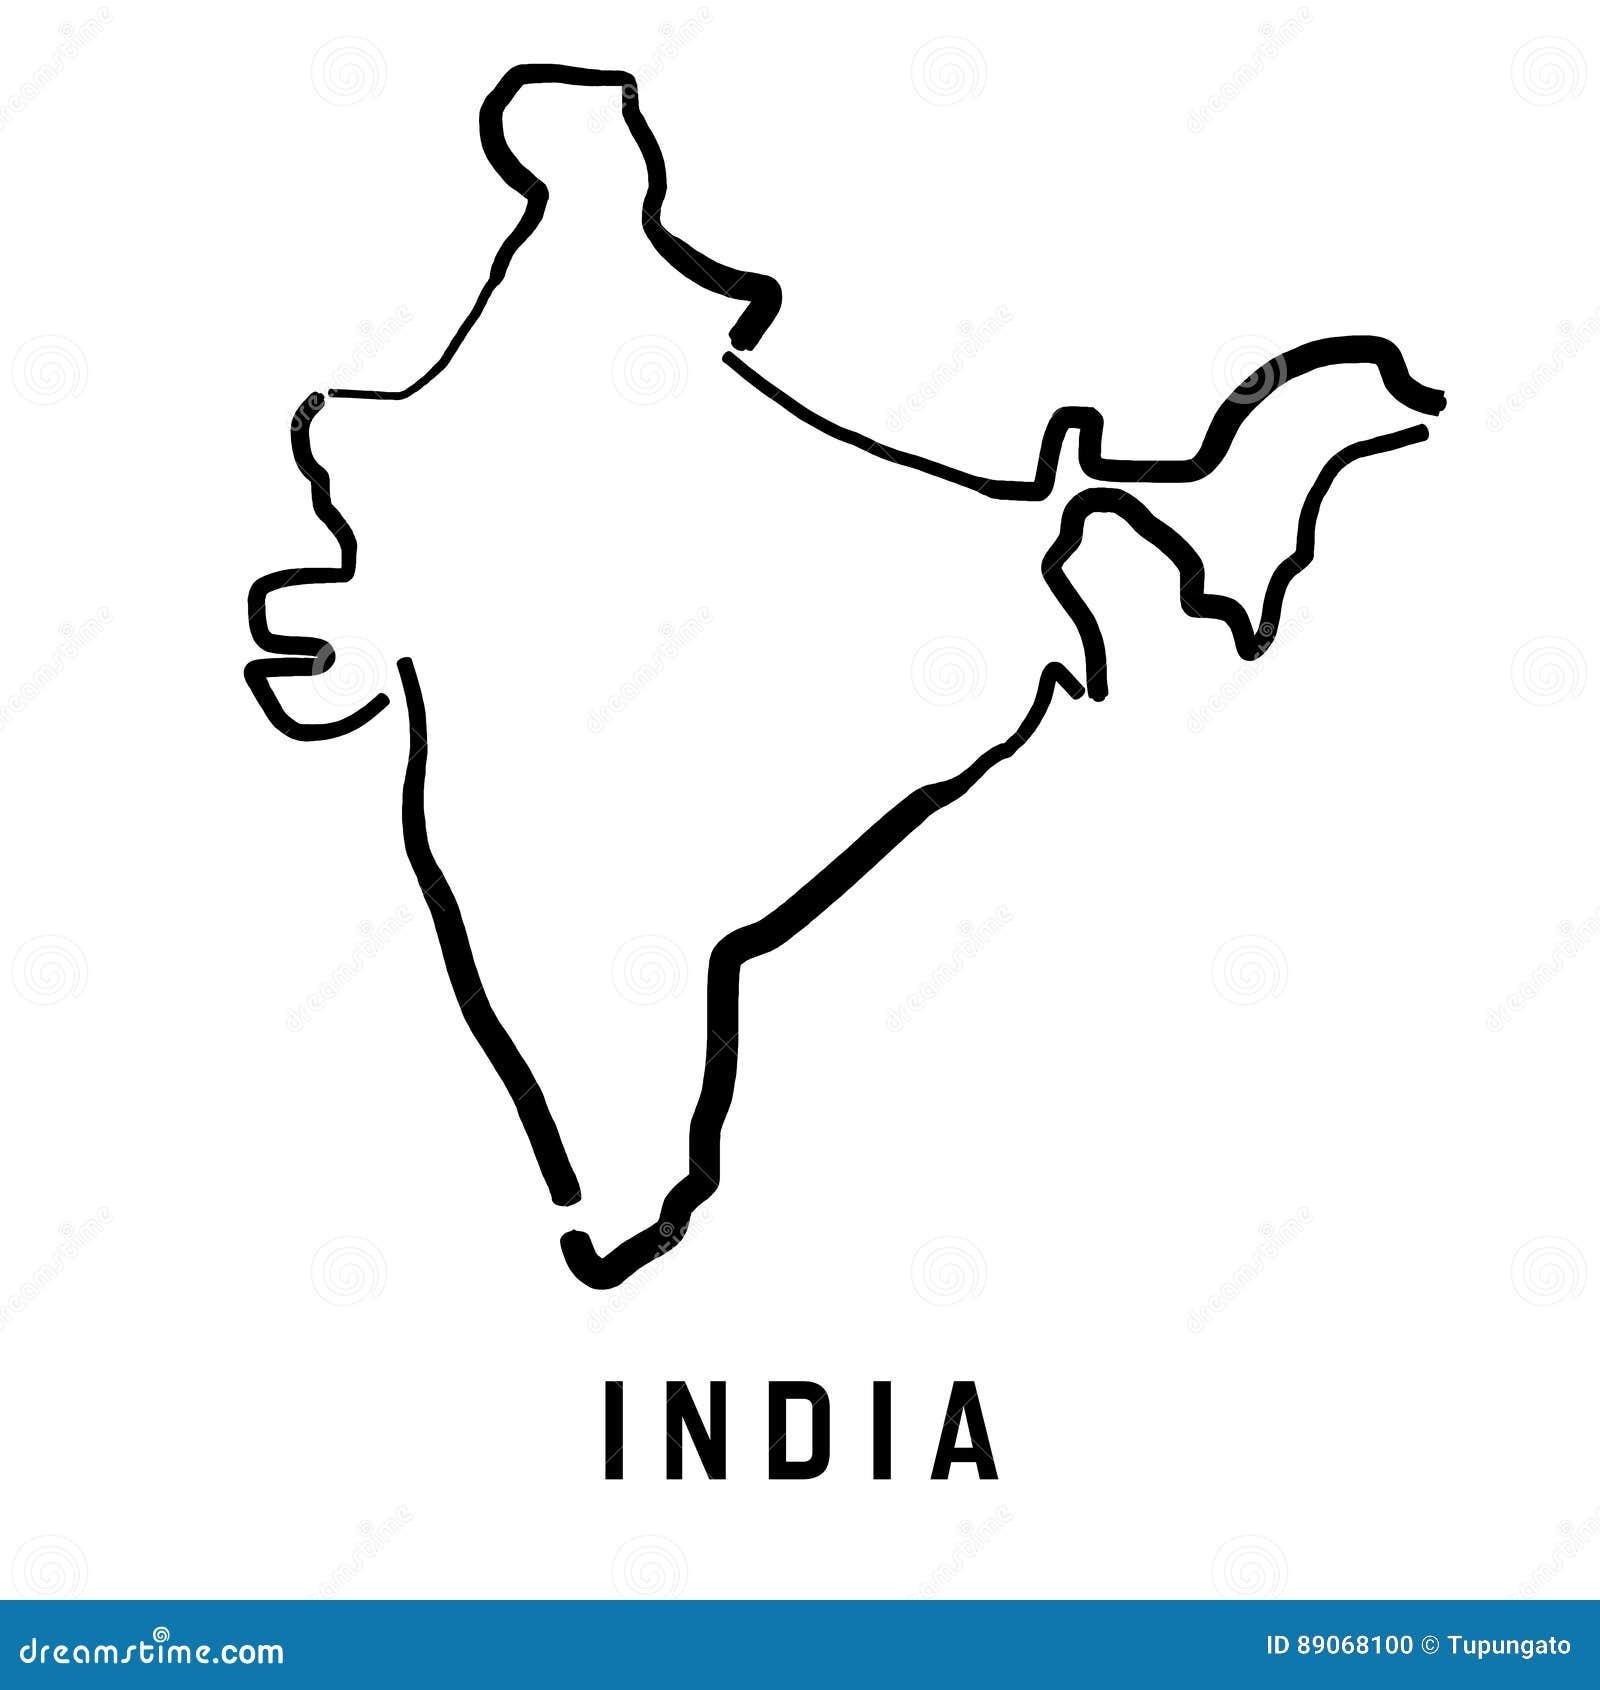 India Map Stock Illustration. Illustration Of Logo